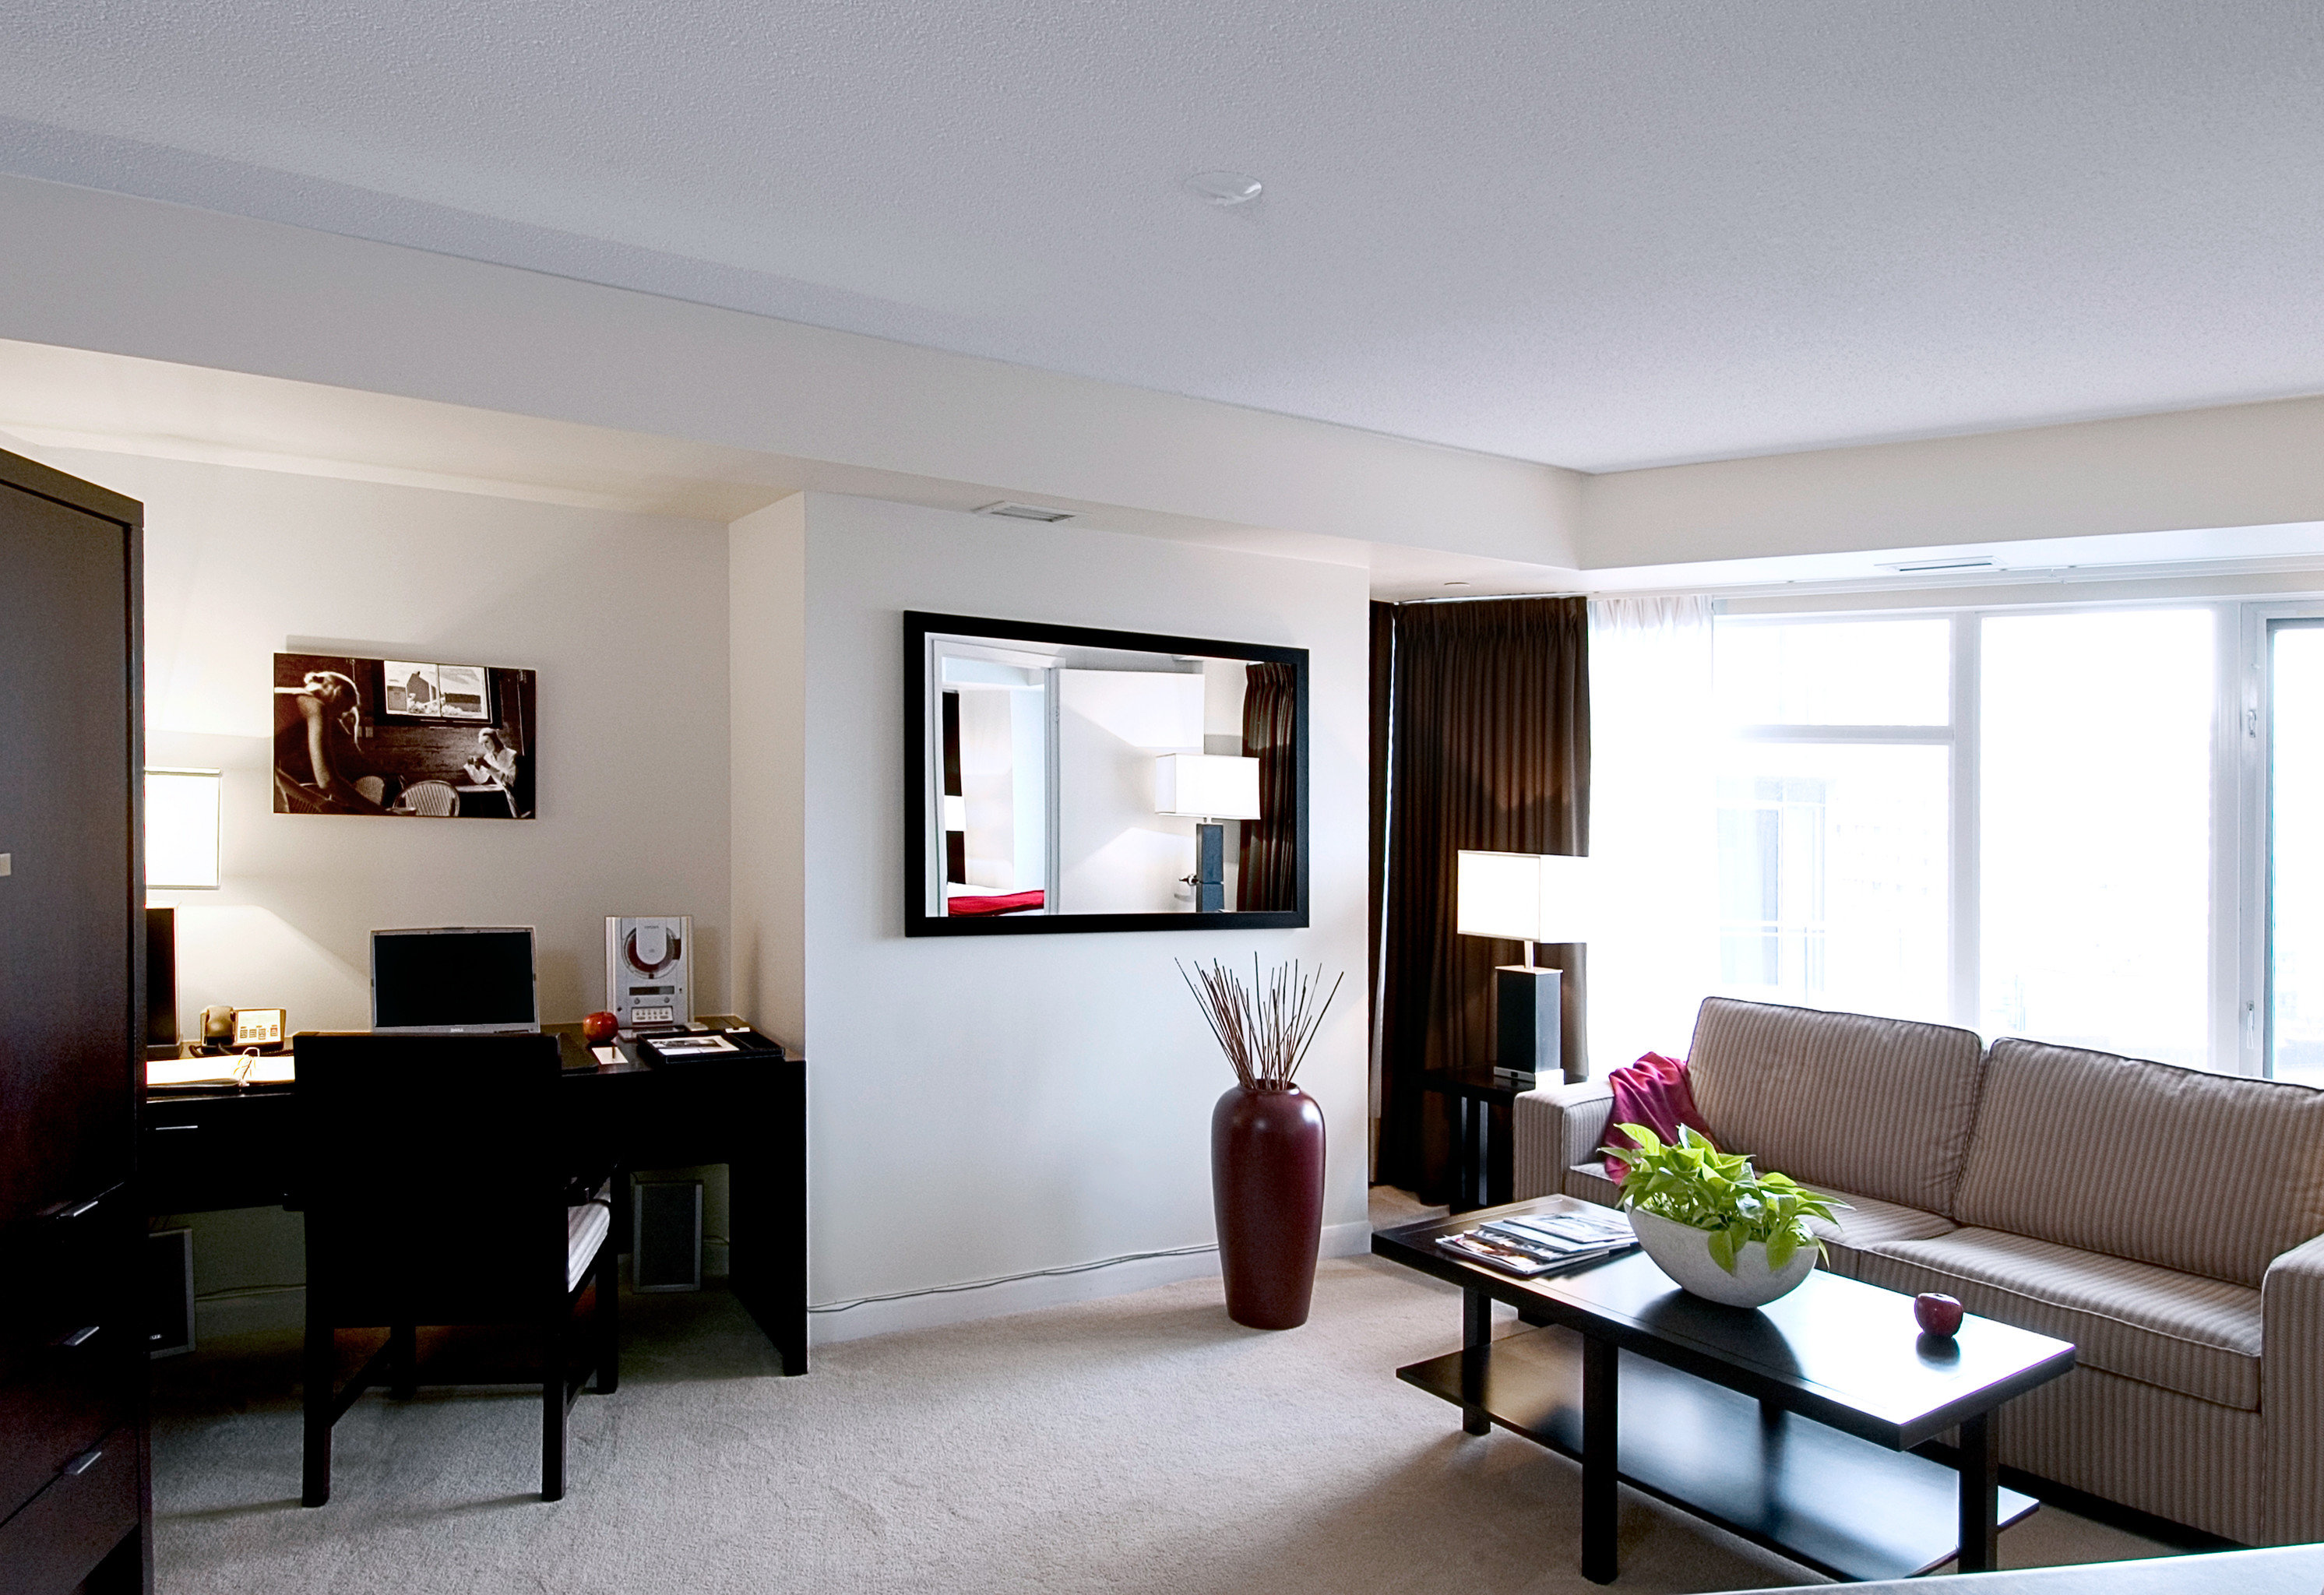 Bedroom Budget City Lounge Modern Suite sofa property living room home condominium flat